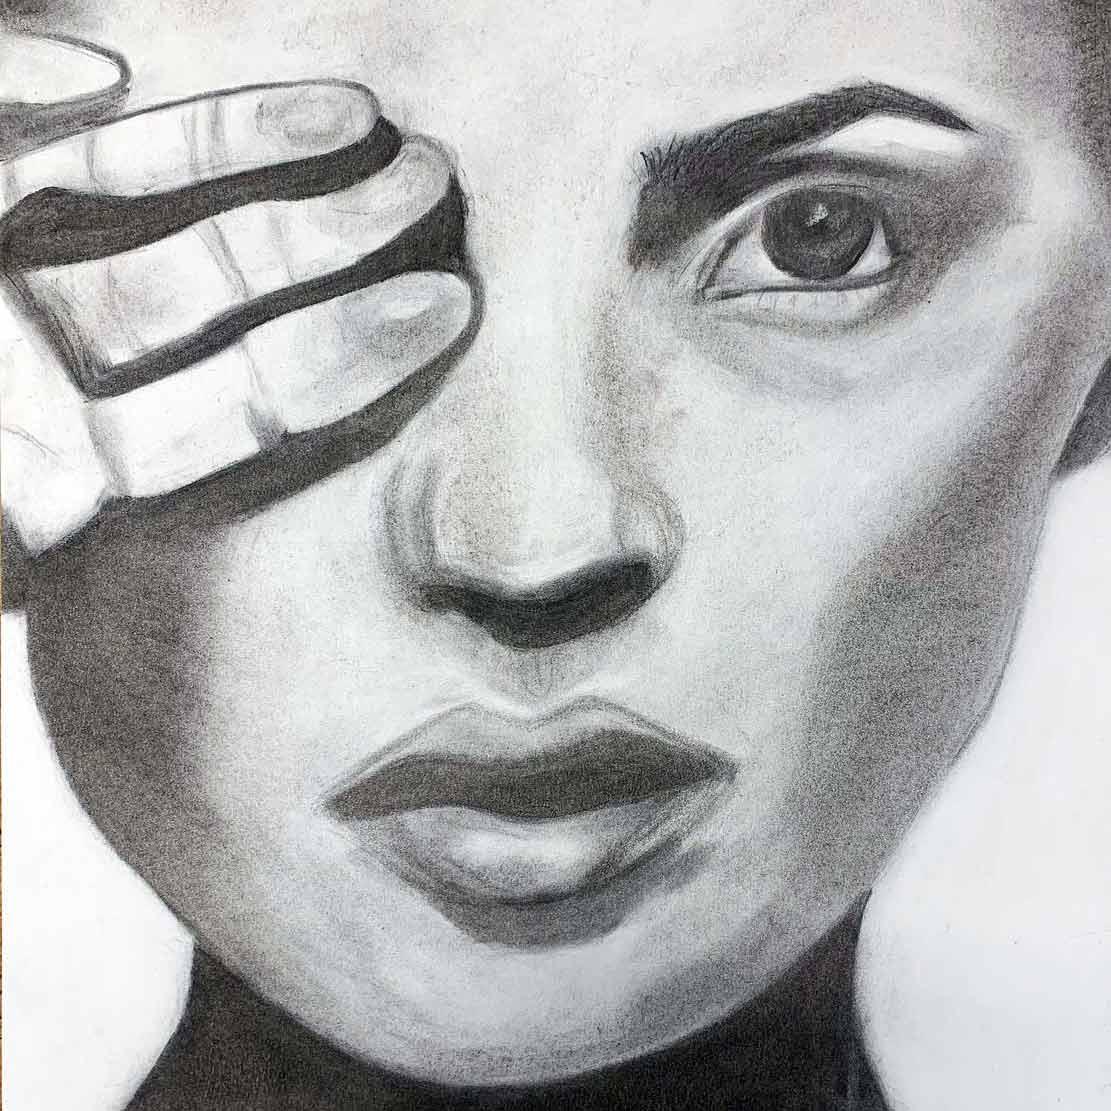 Shelford Girls' Grammar student artwork